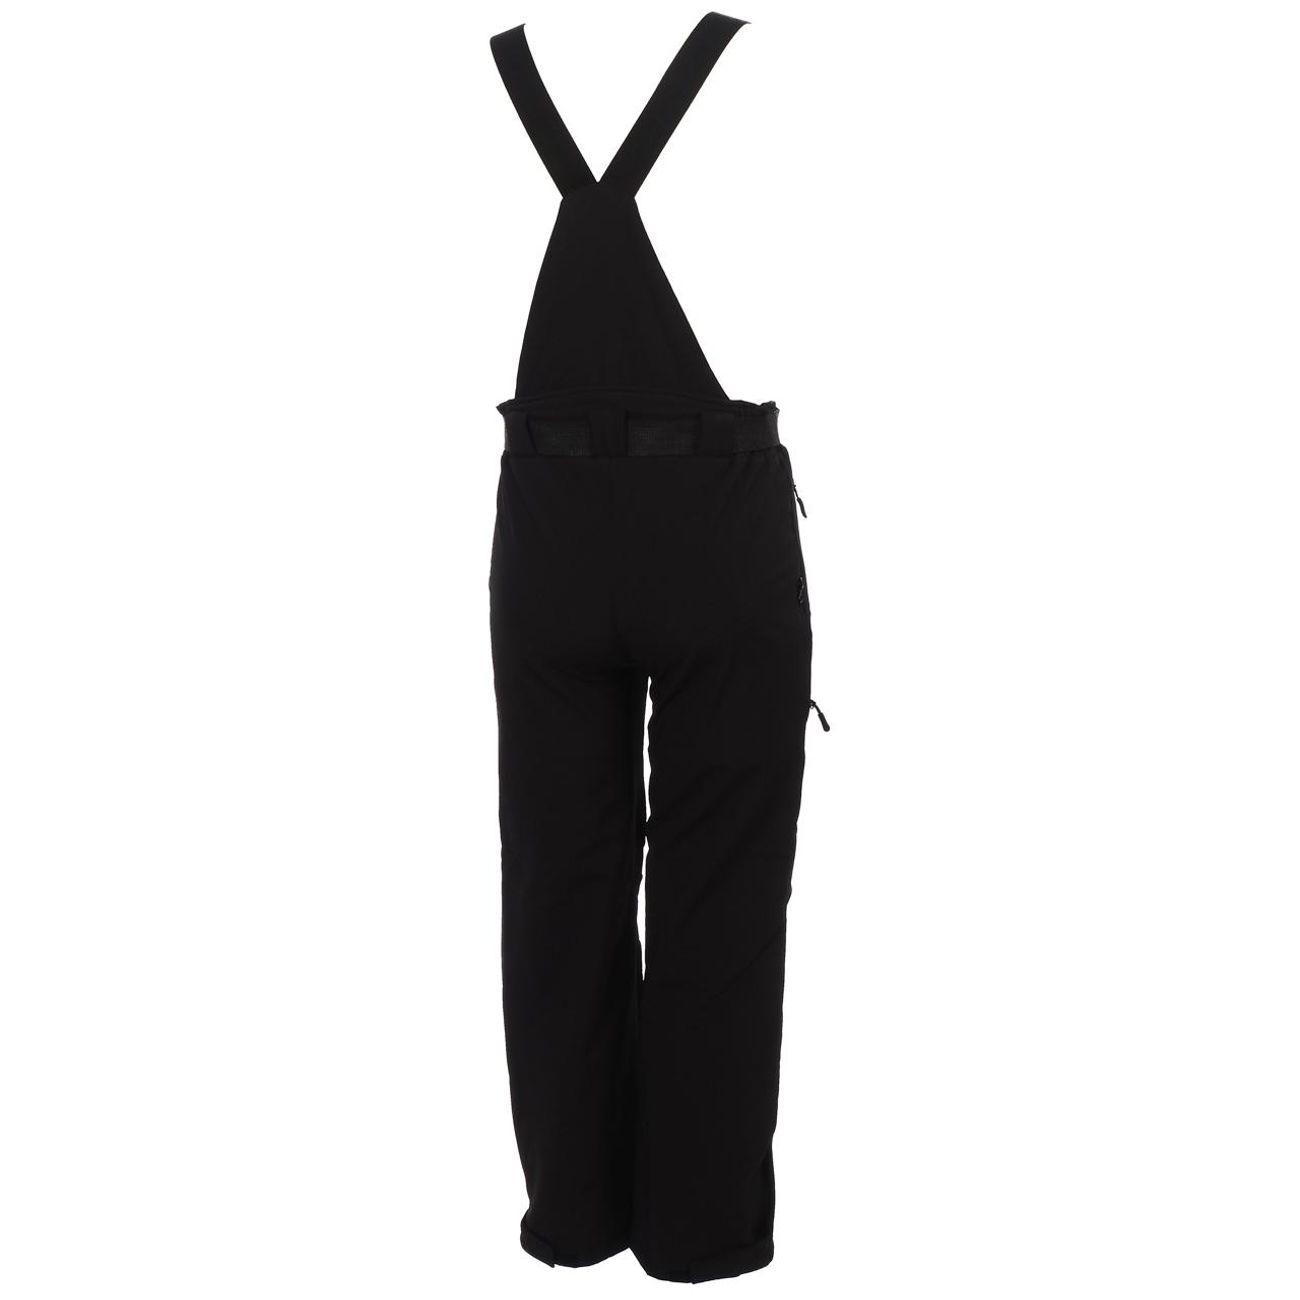 Ski homme Eldera sportswear Unosoft noir skipant